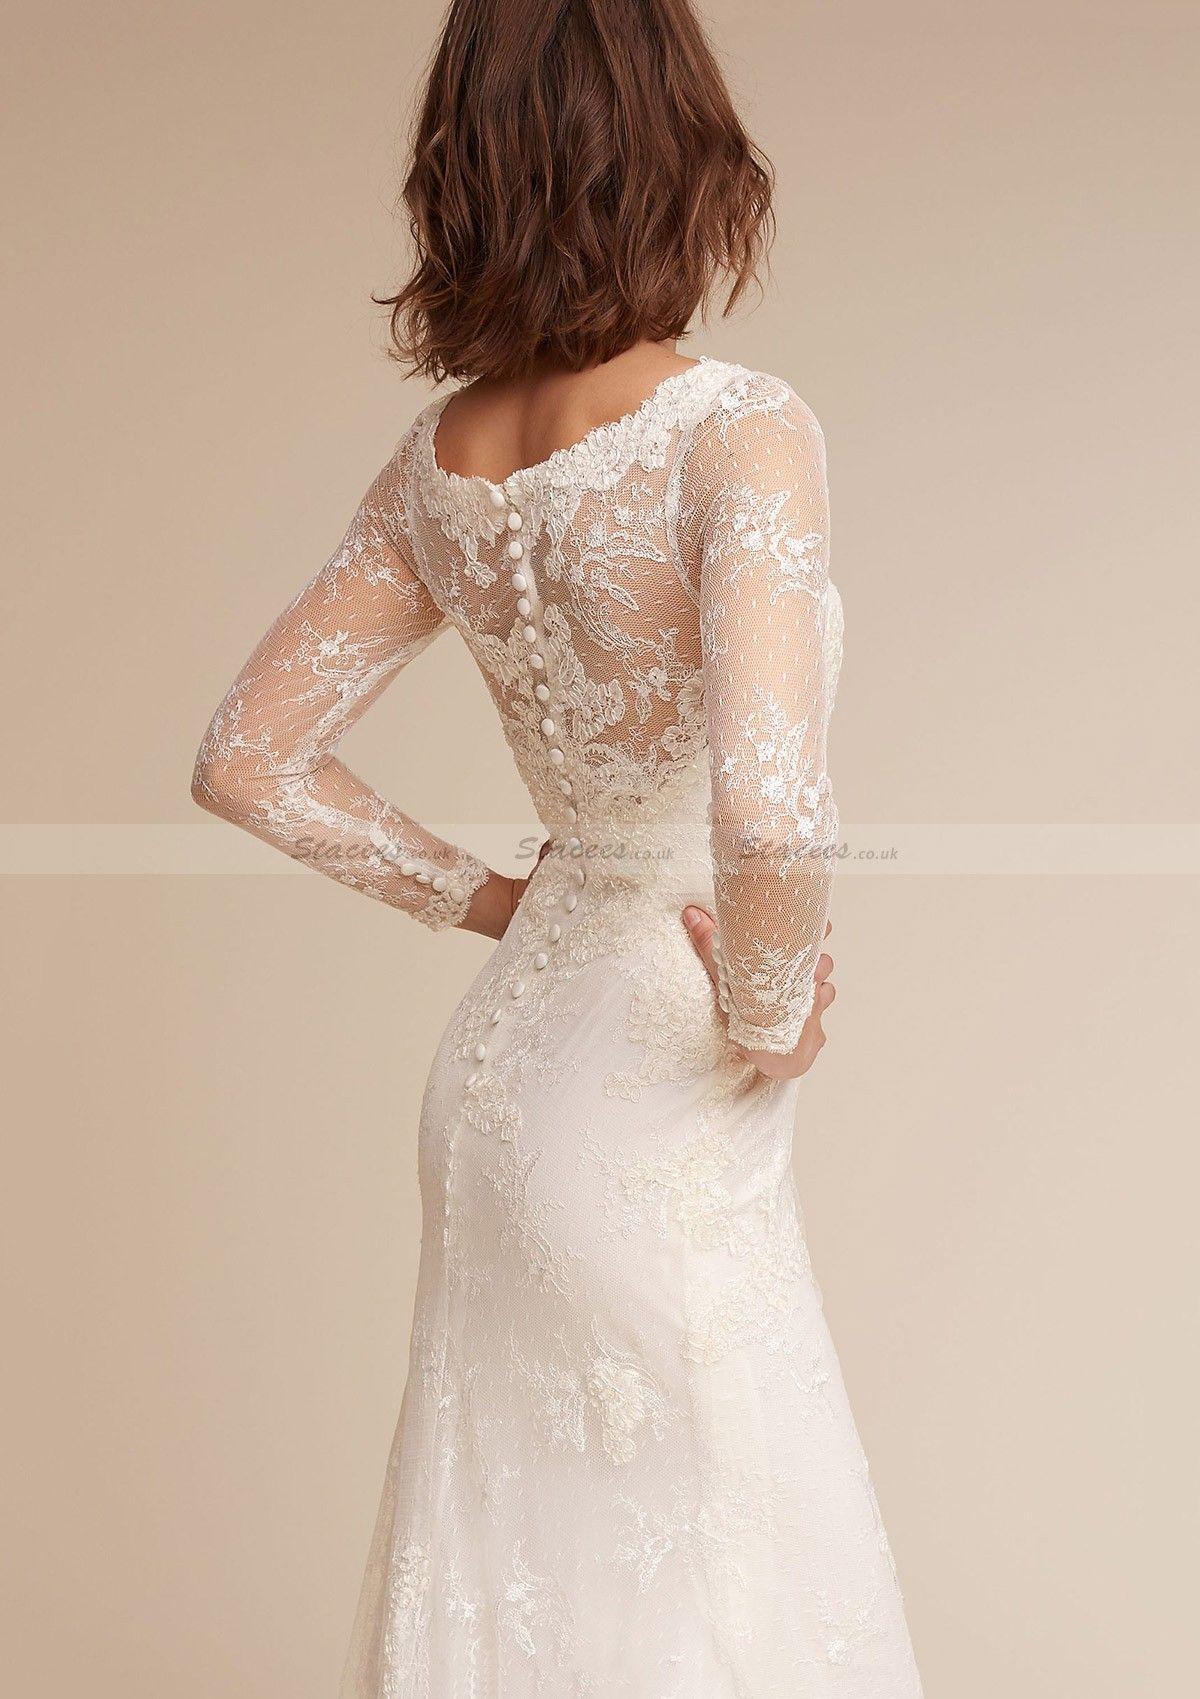 Tulle wedding dress sheathcolumn bateau sweep train with appliqued